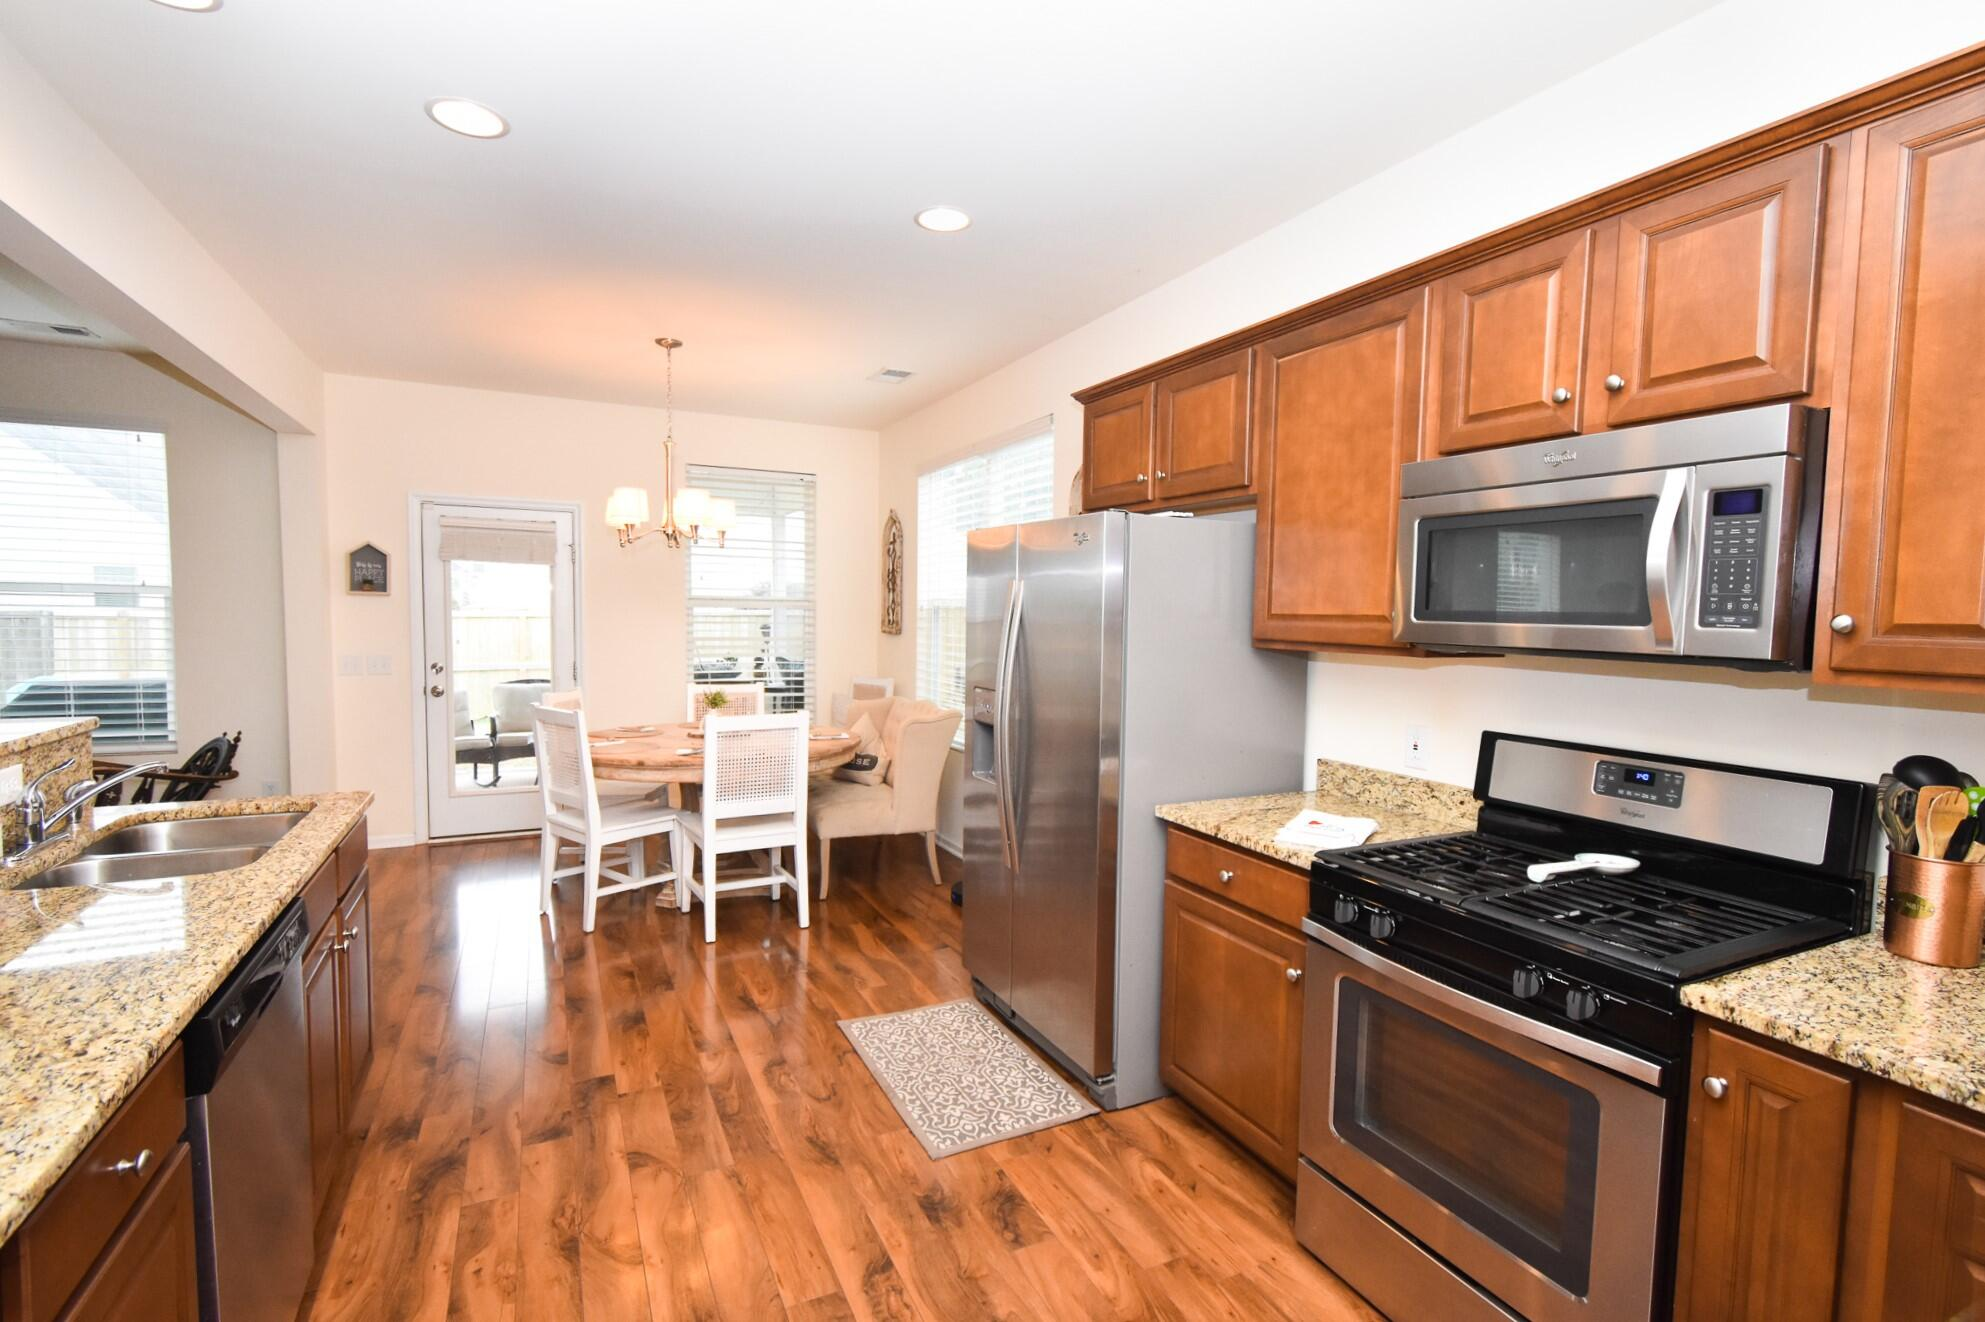 Lieben Park Homes For Sale - 3565 Locklear, Mount Pleasant, SC - 3